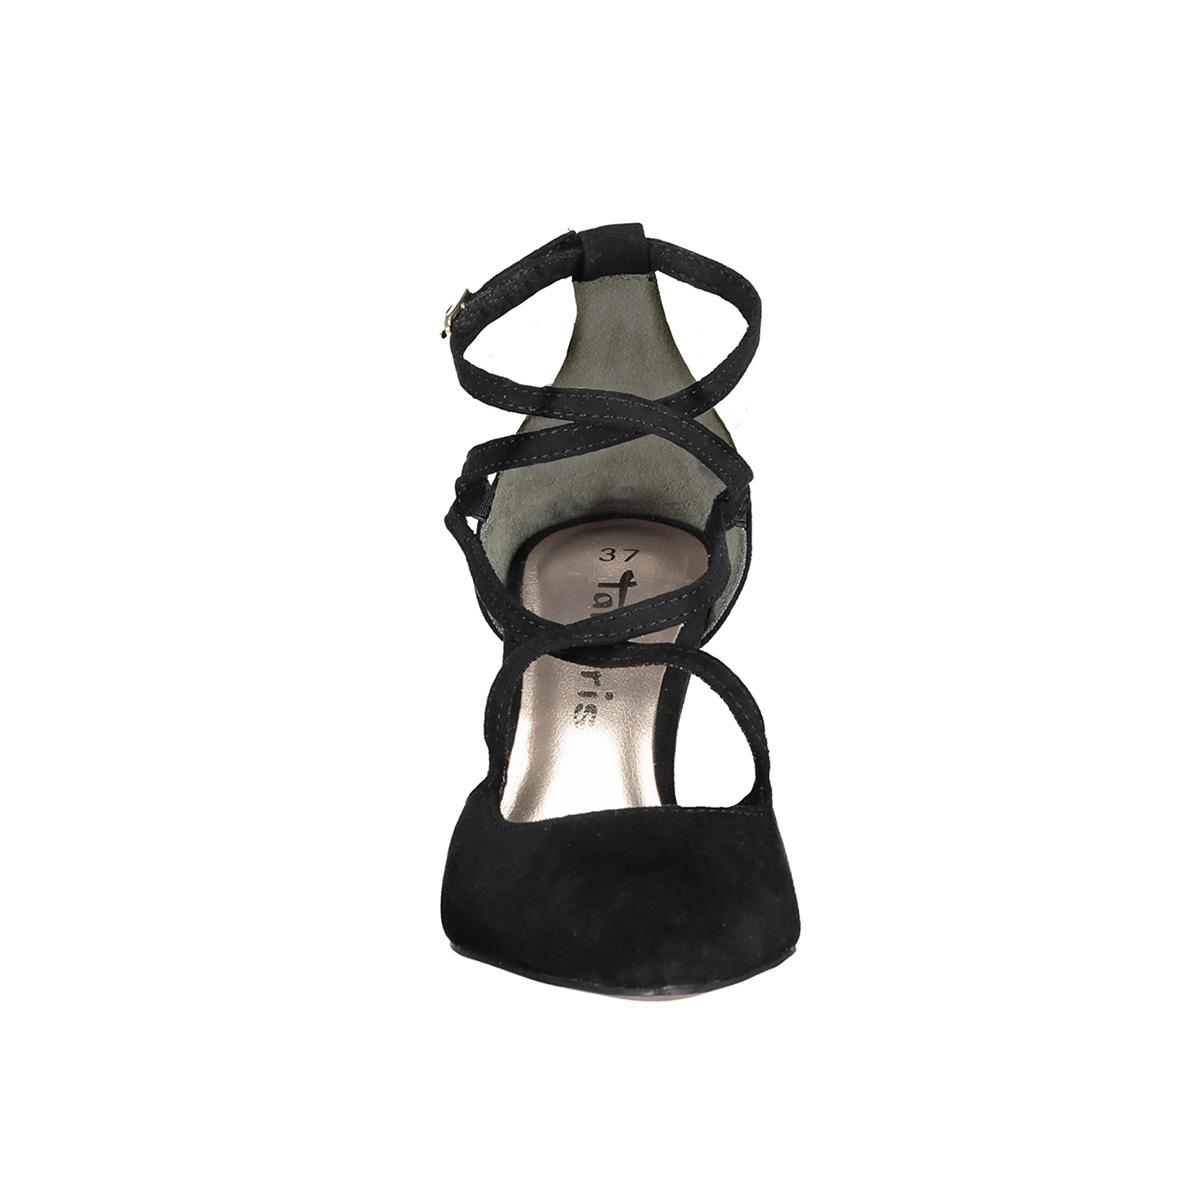 1-1-24400-20 tamaris pump 001